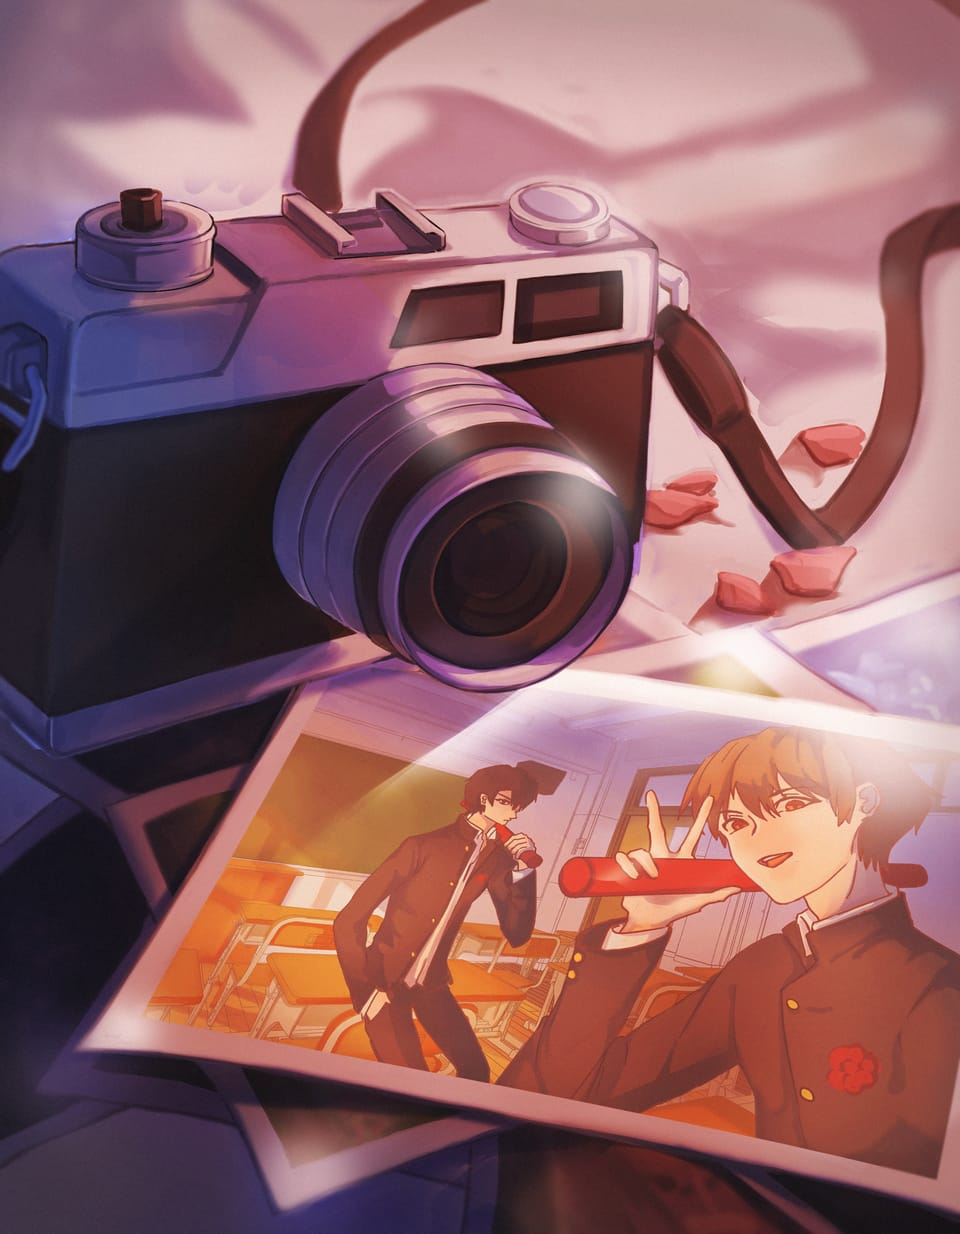 Take A Picture(o゚v゚)ノ Illust of Sago BackgroundImageContest_Using_Division Background_Image_Contest original